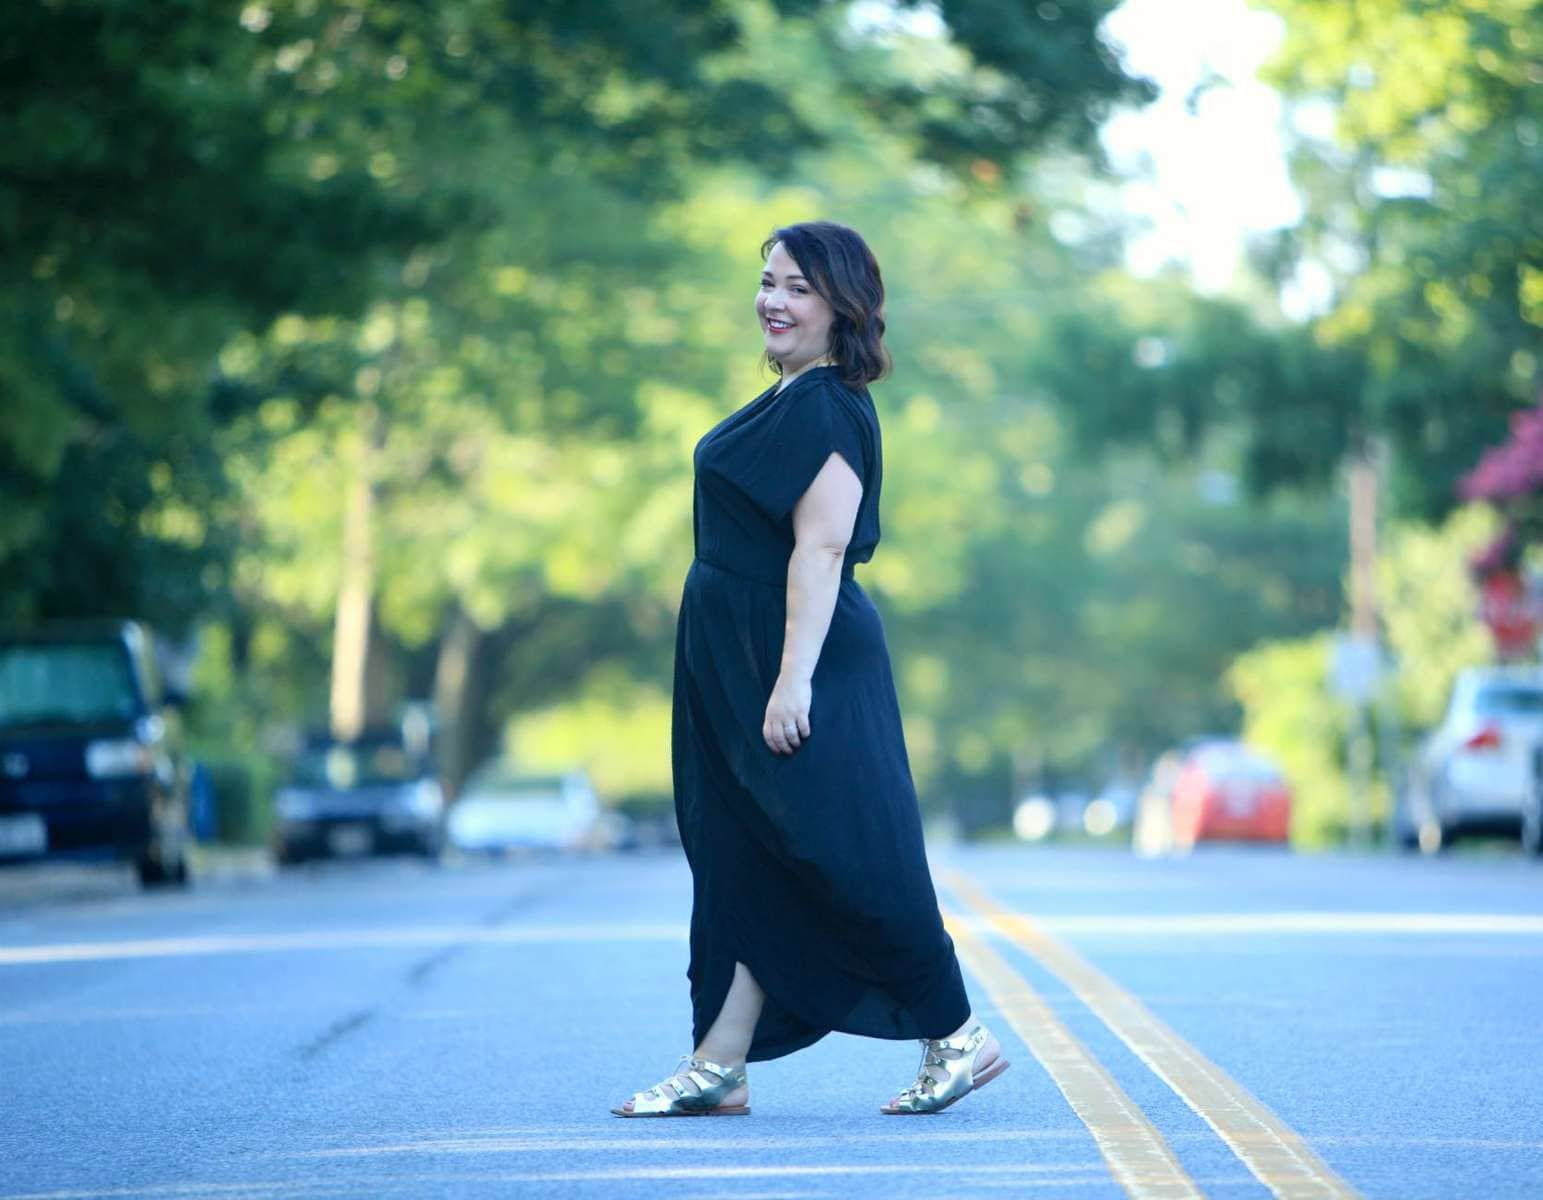 Wardrobe Oxygen in the Myne LA 'Heidi' dress in black silk with gold gladiator sandals